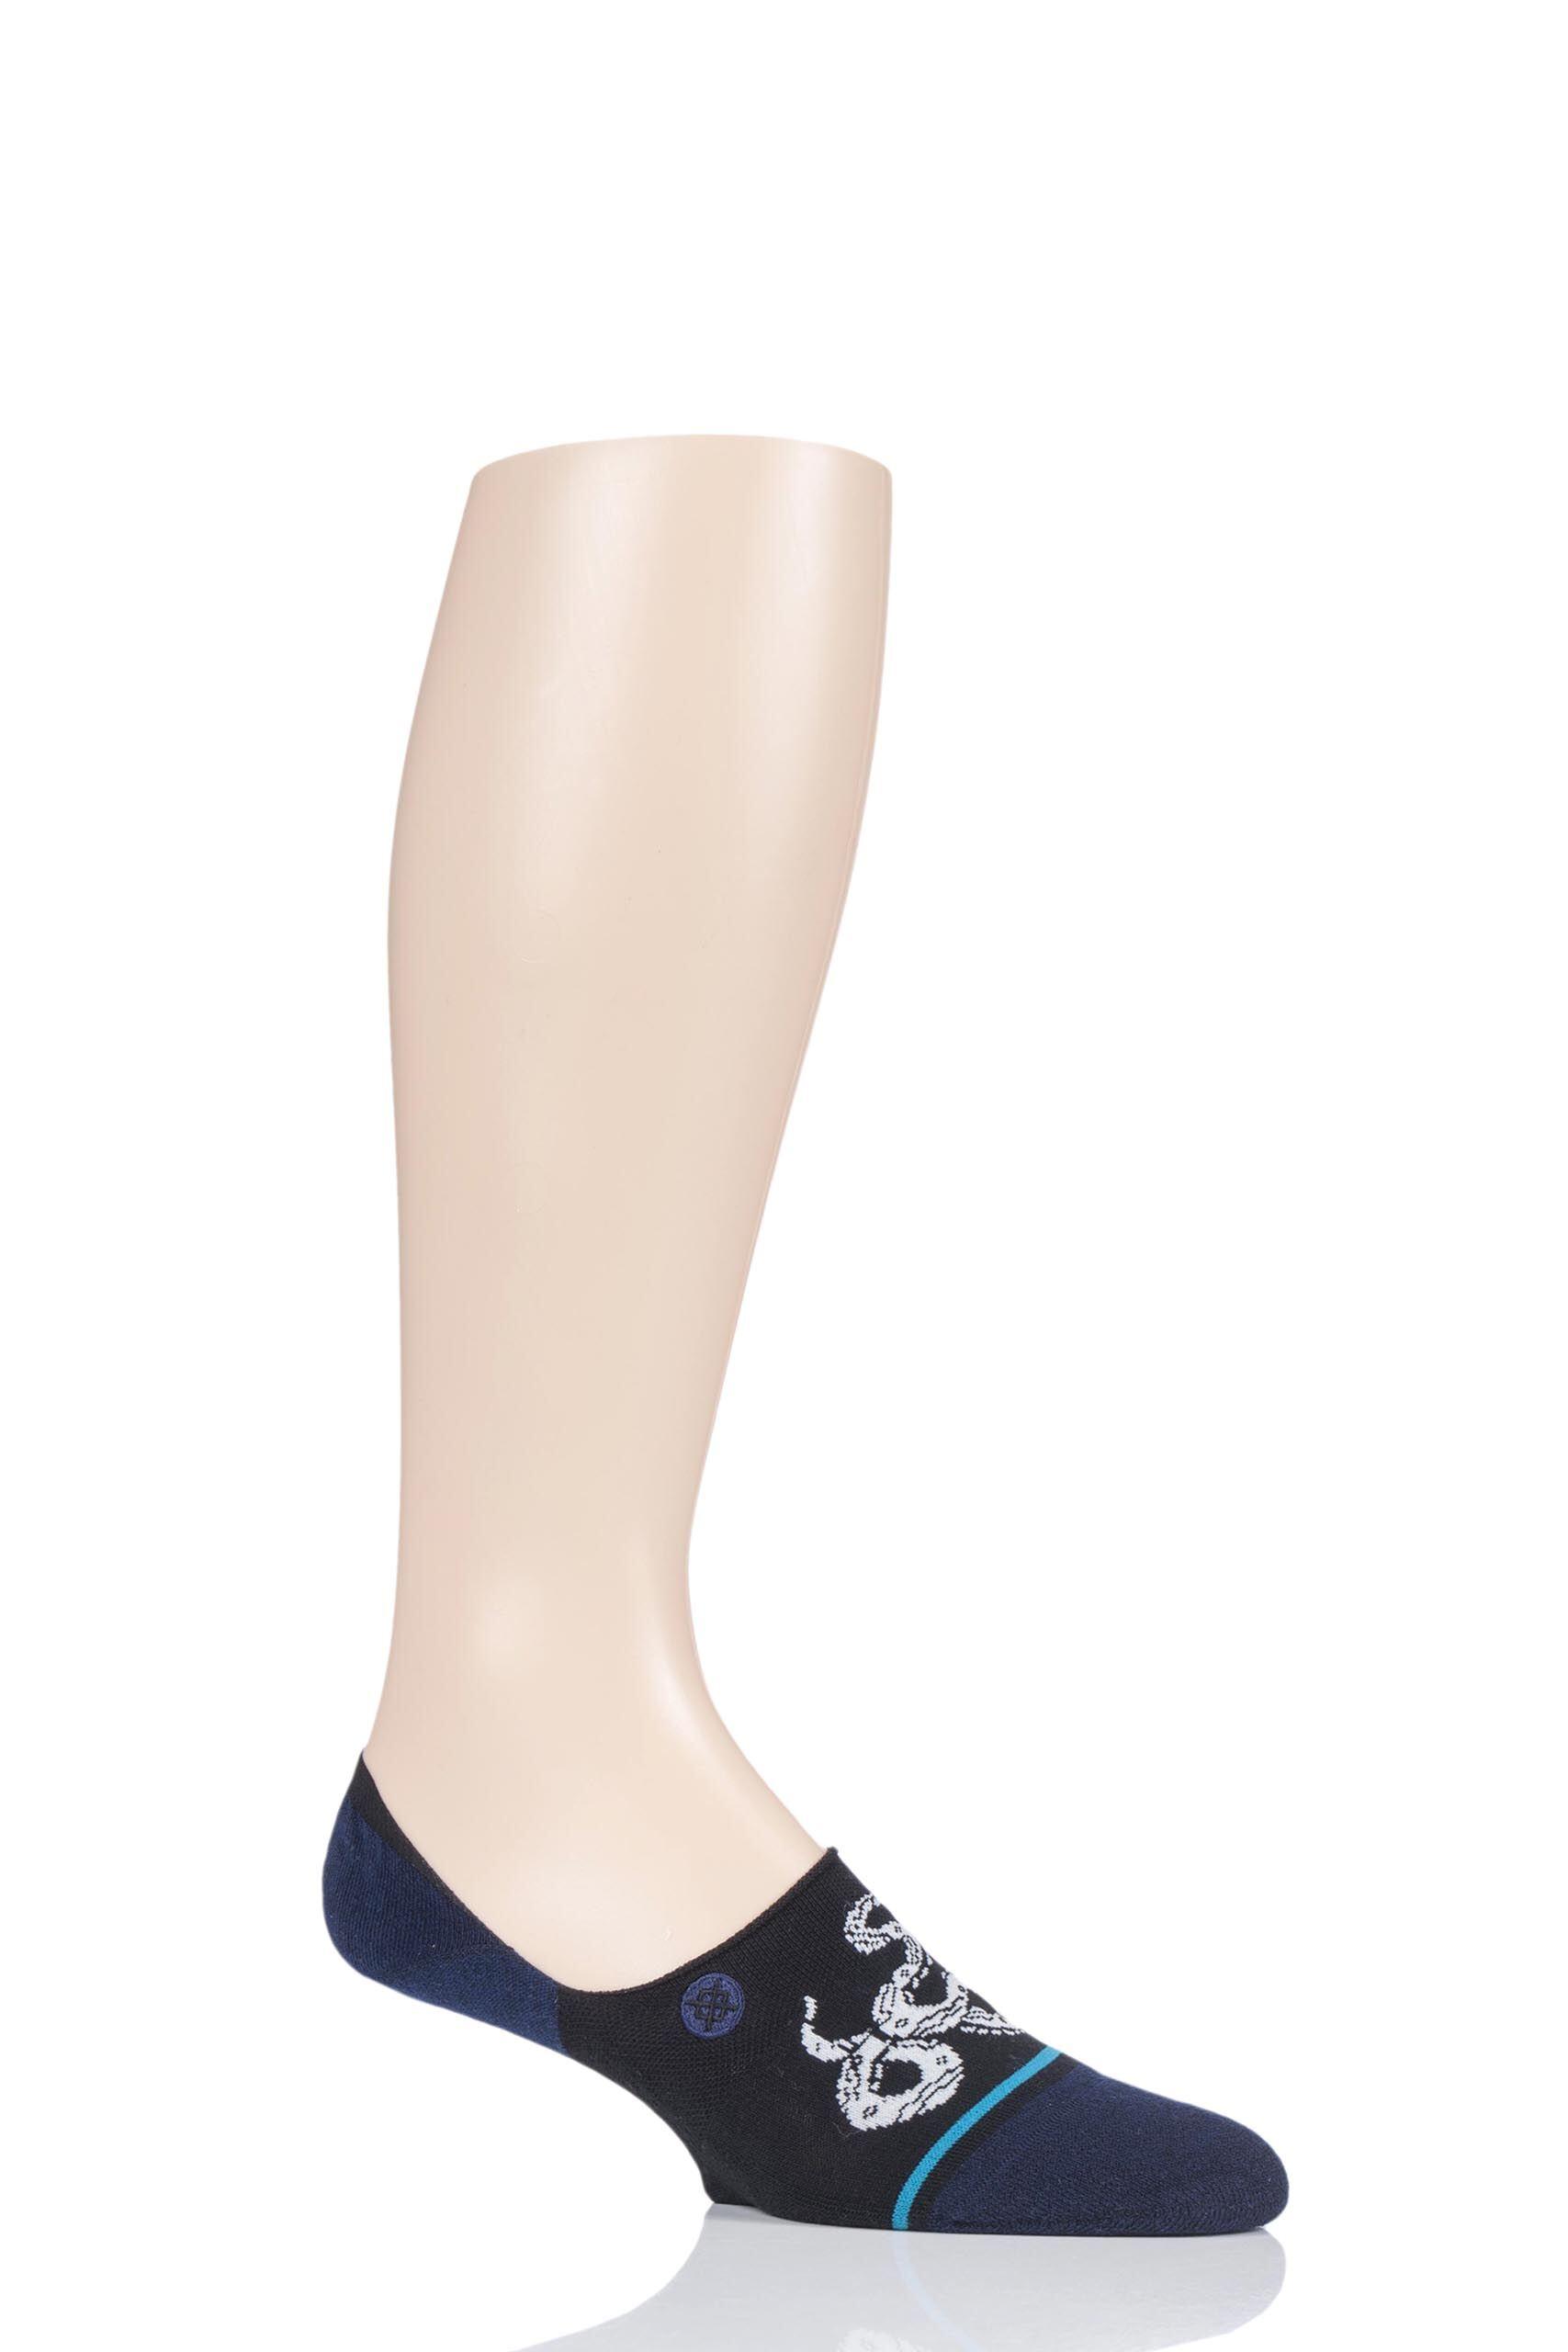 Image of 1 Pair Black Crotalus Cotton Socks Men's 8.5-11.5 Mens - Stance